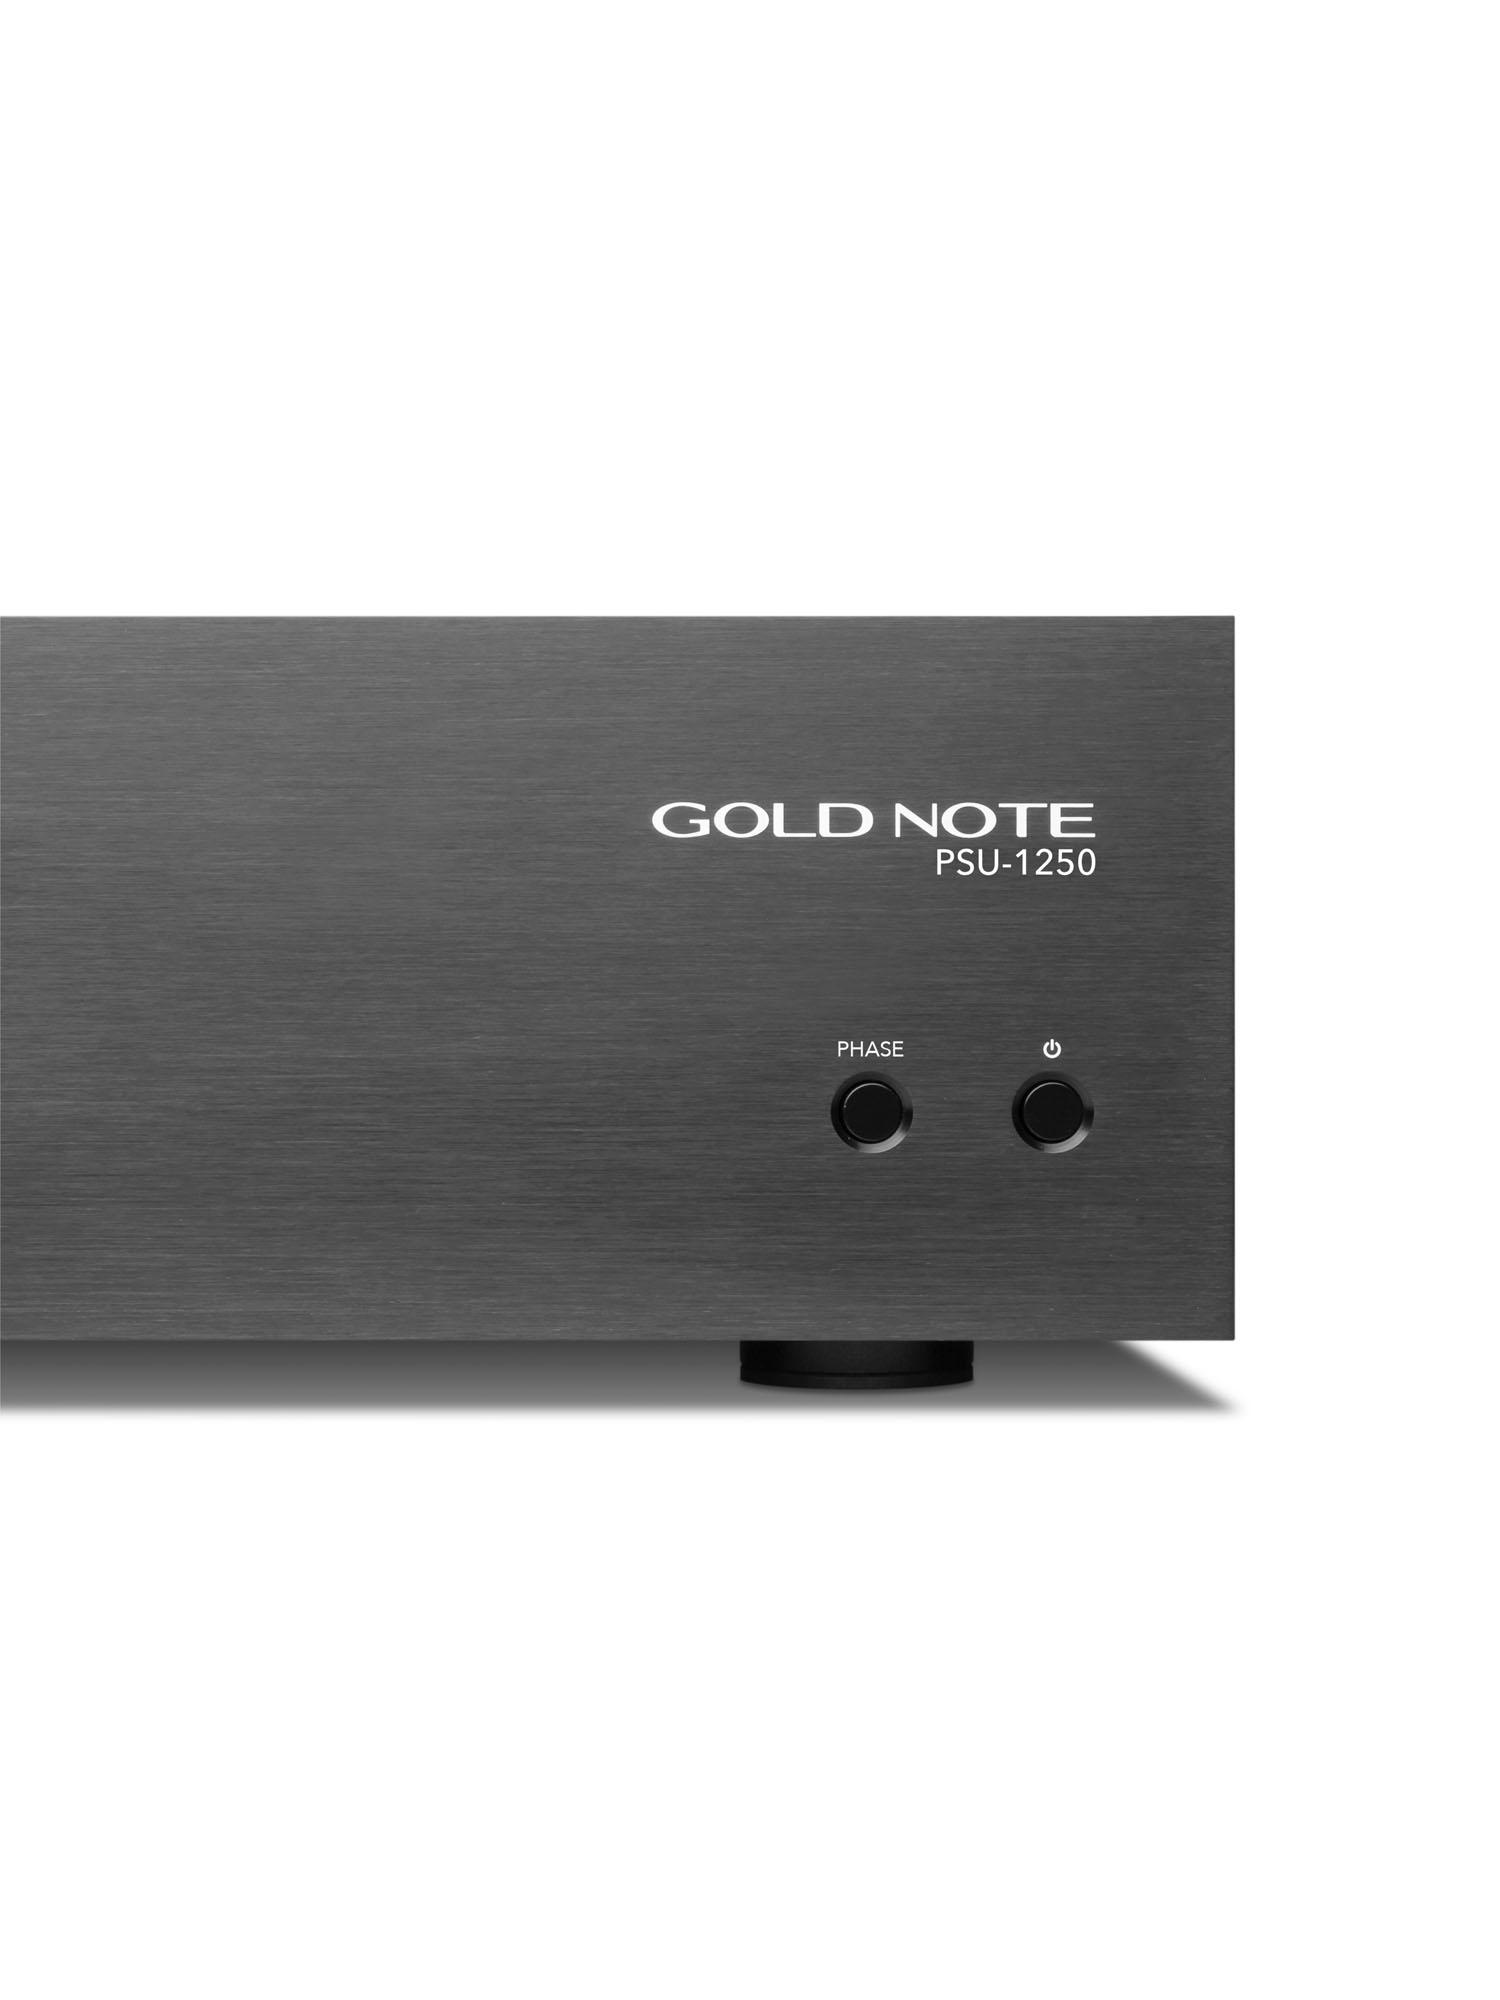 Gold Note PSU-1250 Power Supply